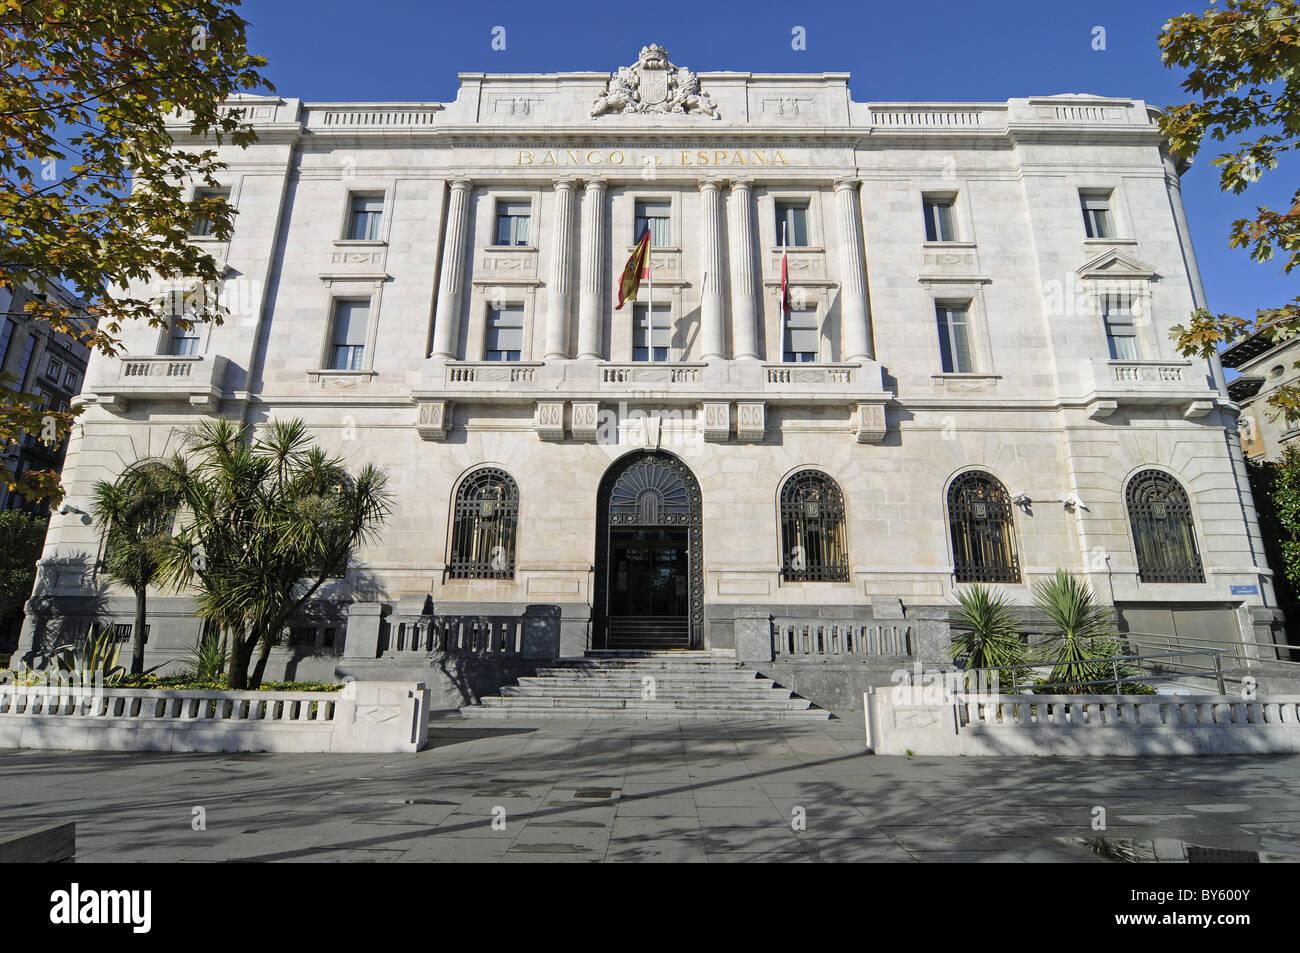 Banco de Espania in Cantabria Spain - Stock Image